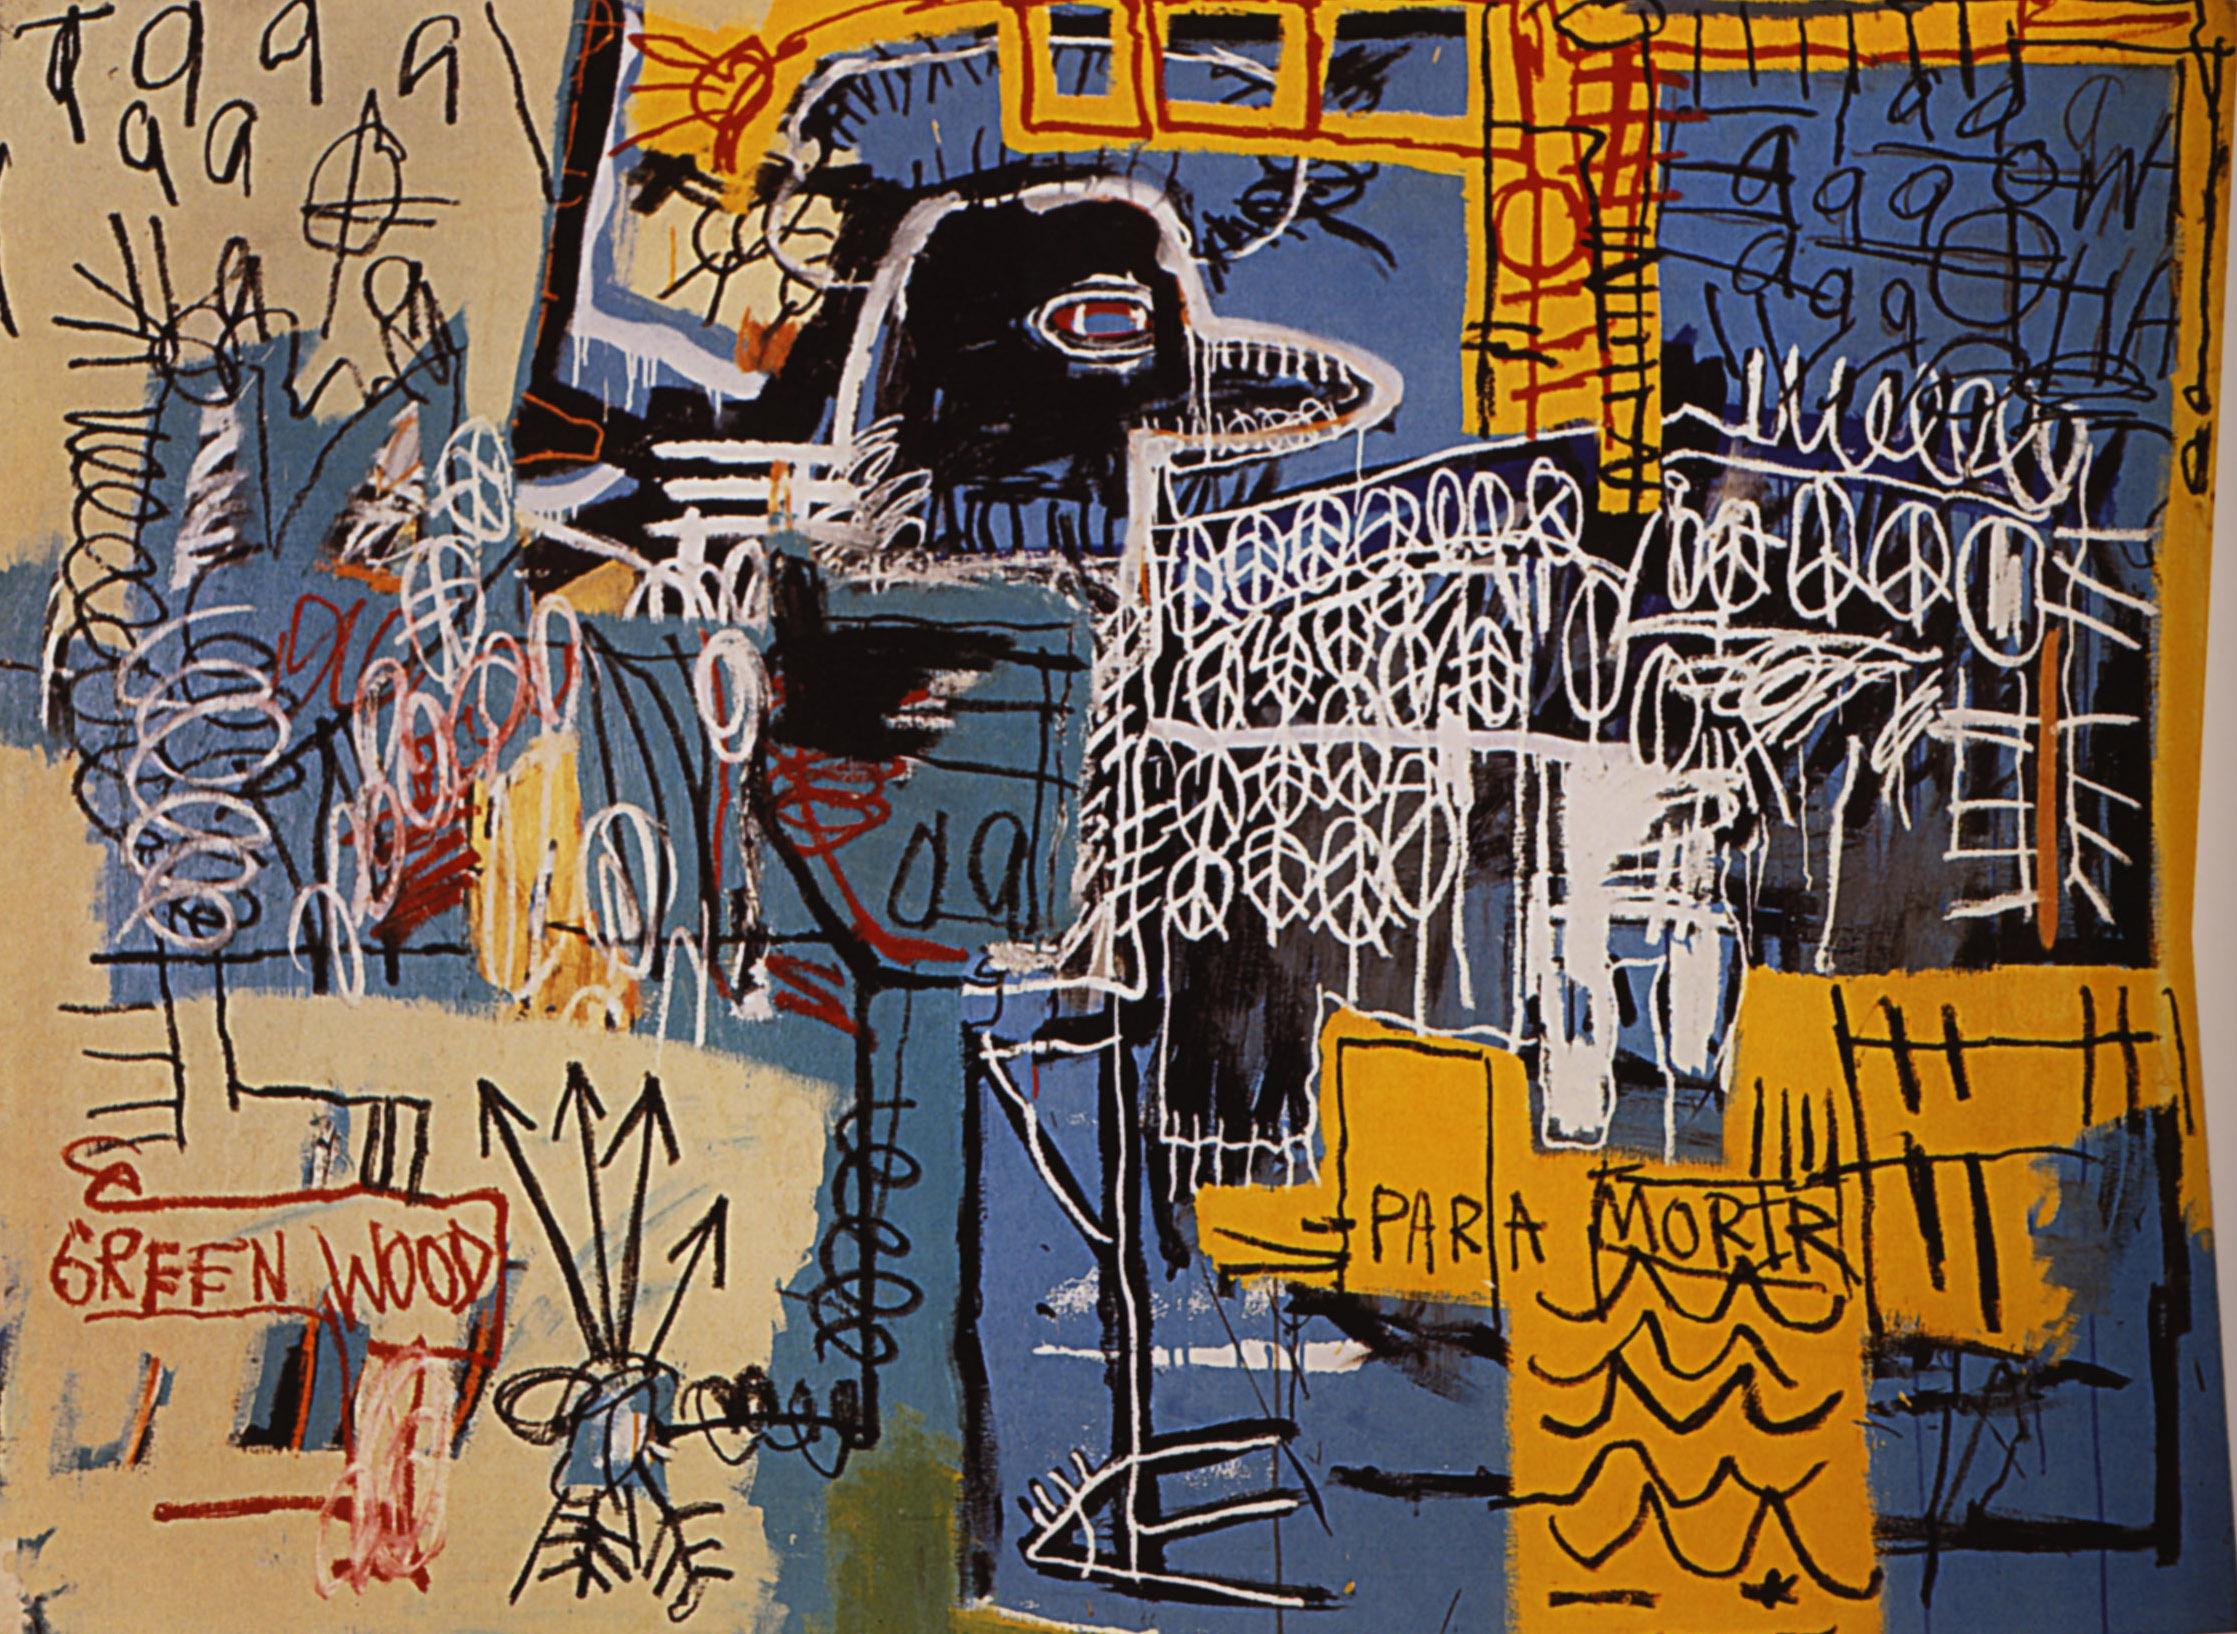 Jean-Michael Basquiat, Bird on Money 1981, acrylic and crayon on canvas